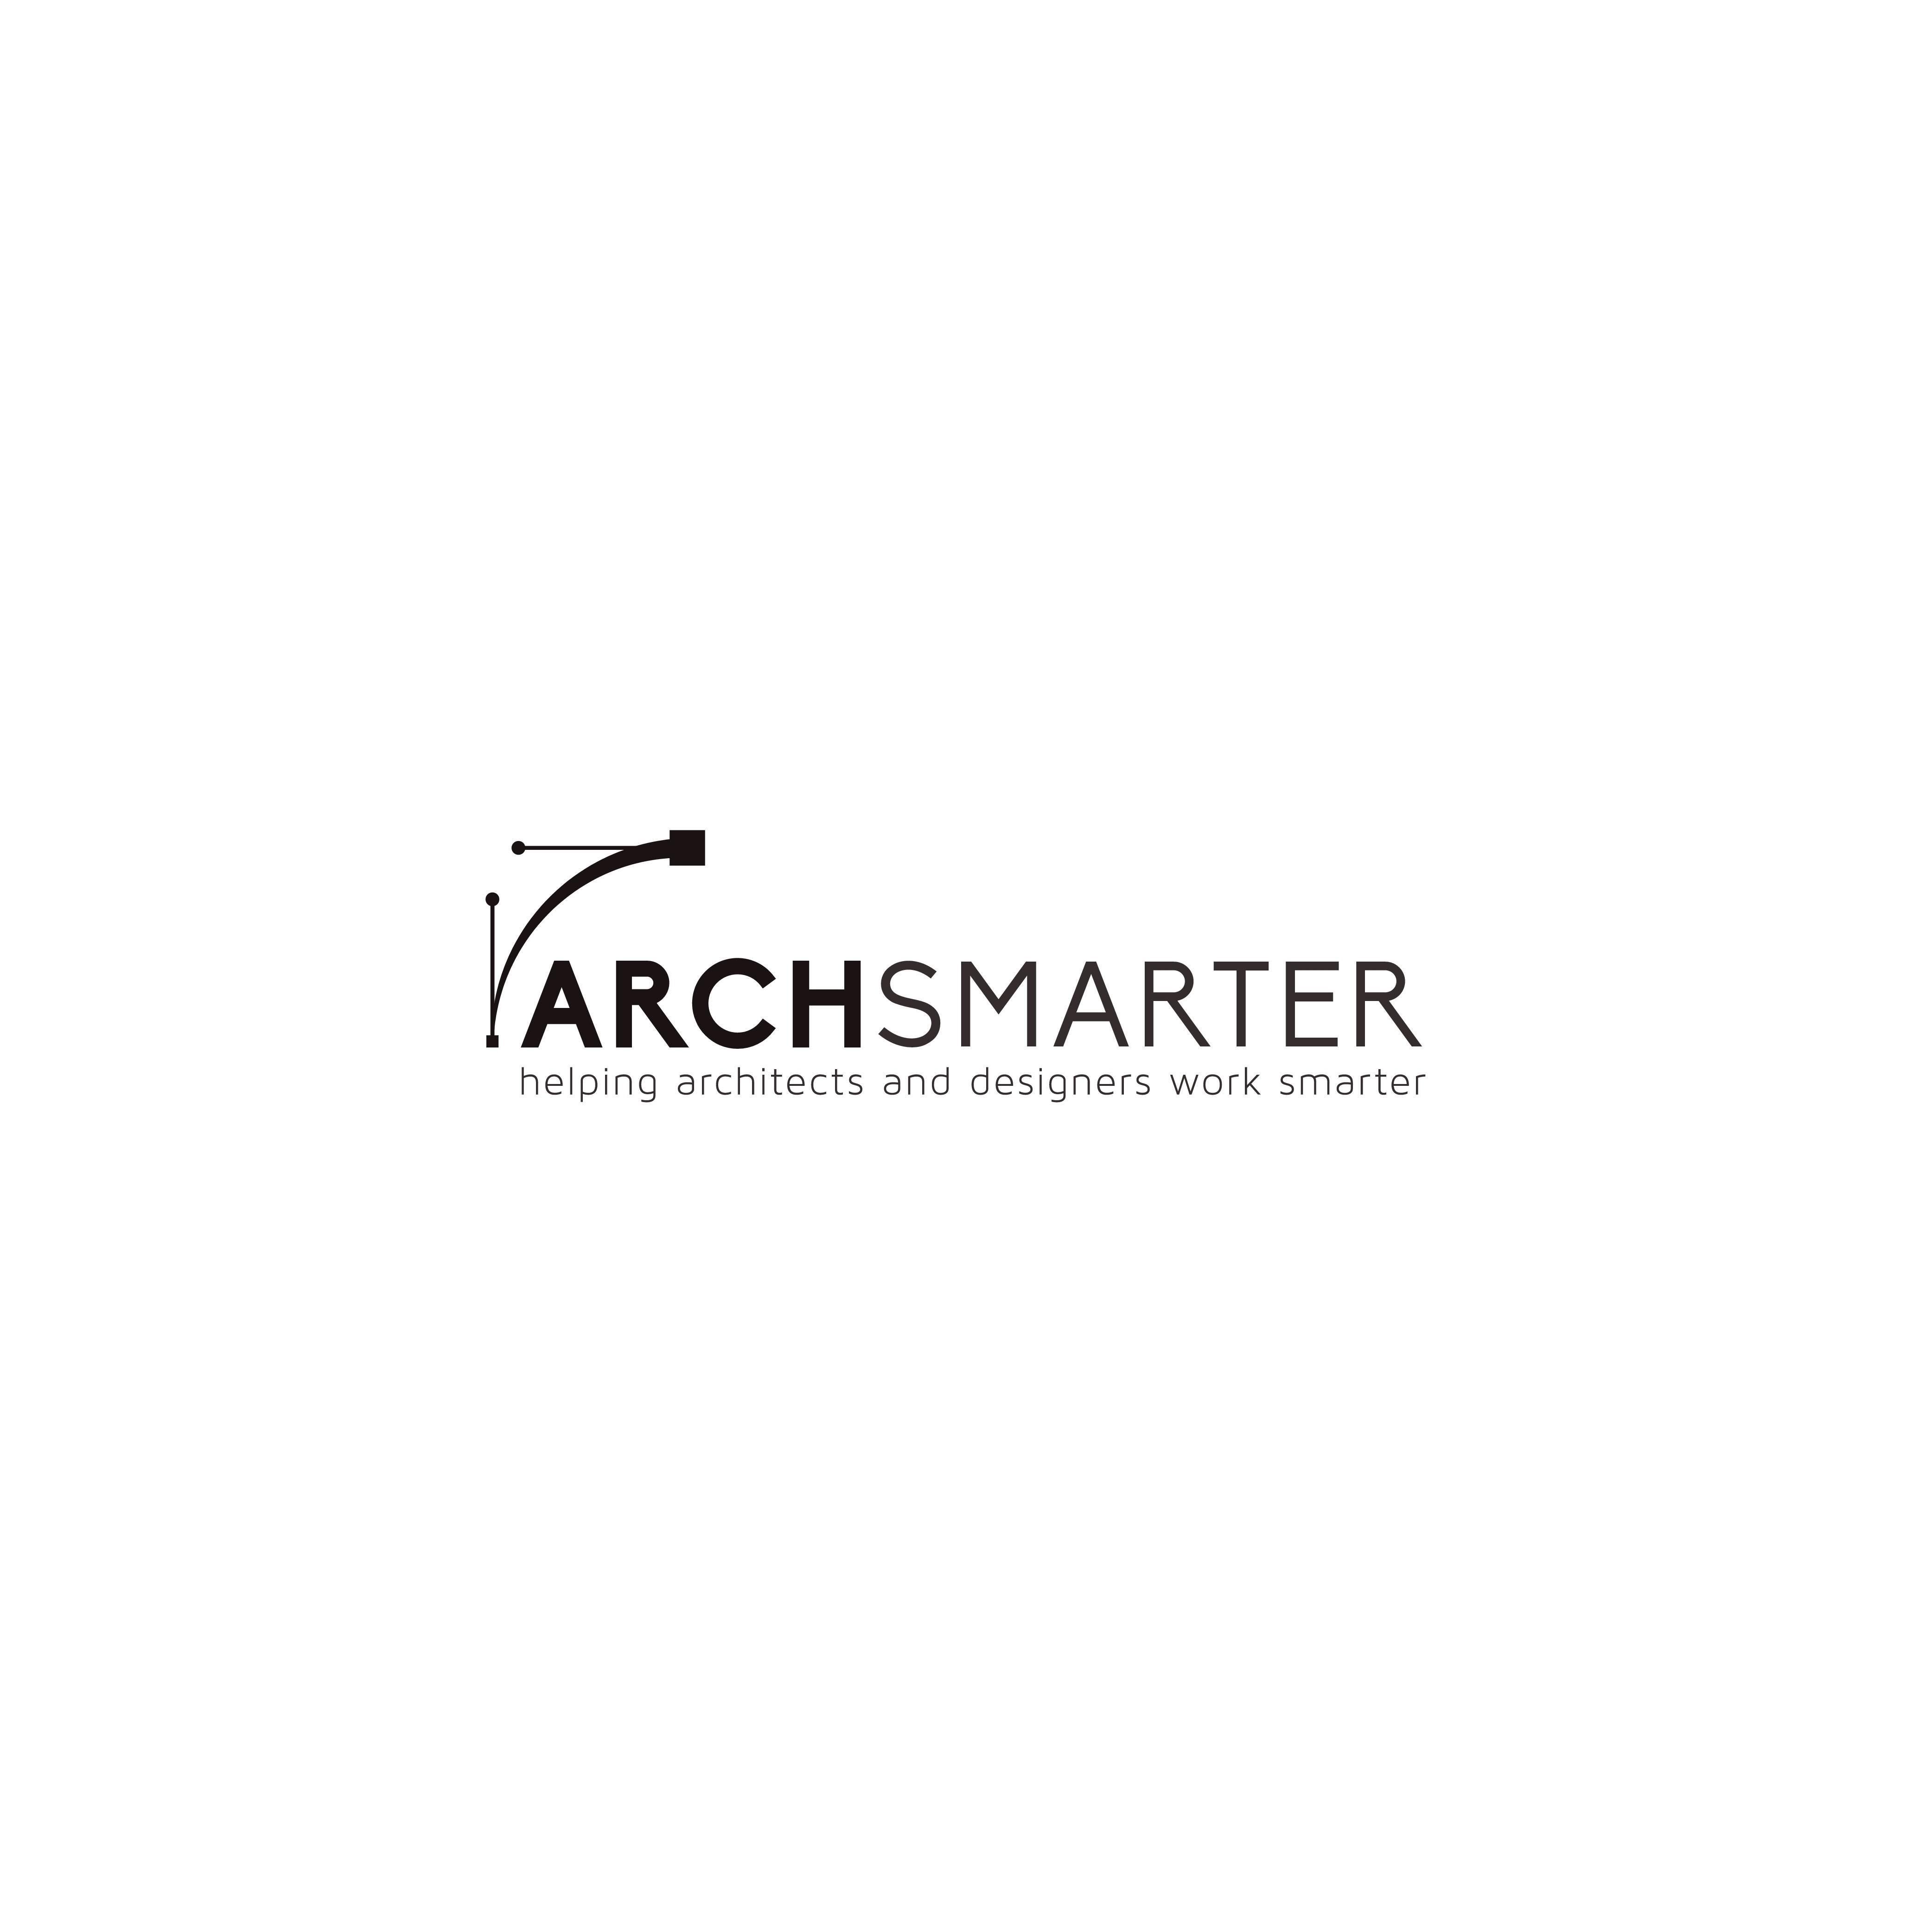 Design a smart logo for ArchSmarter